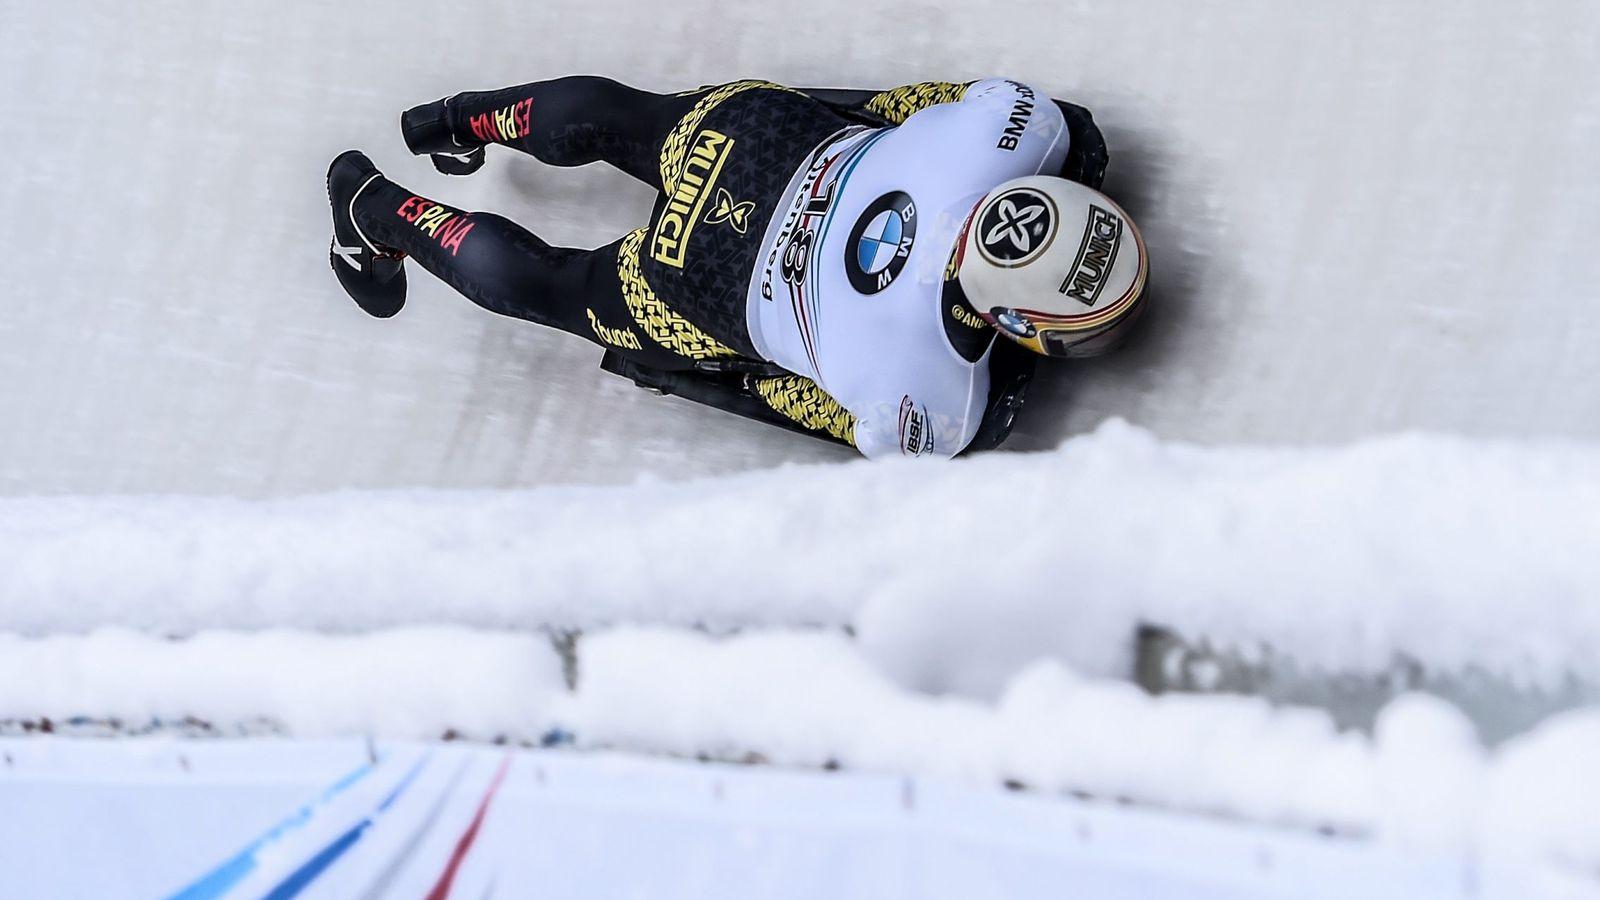 Foto: Mirambell finalizó 16º en Altenberg (Filip Singer/EFE-EPA)